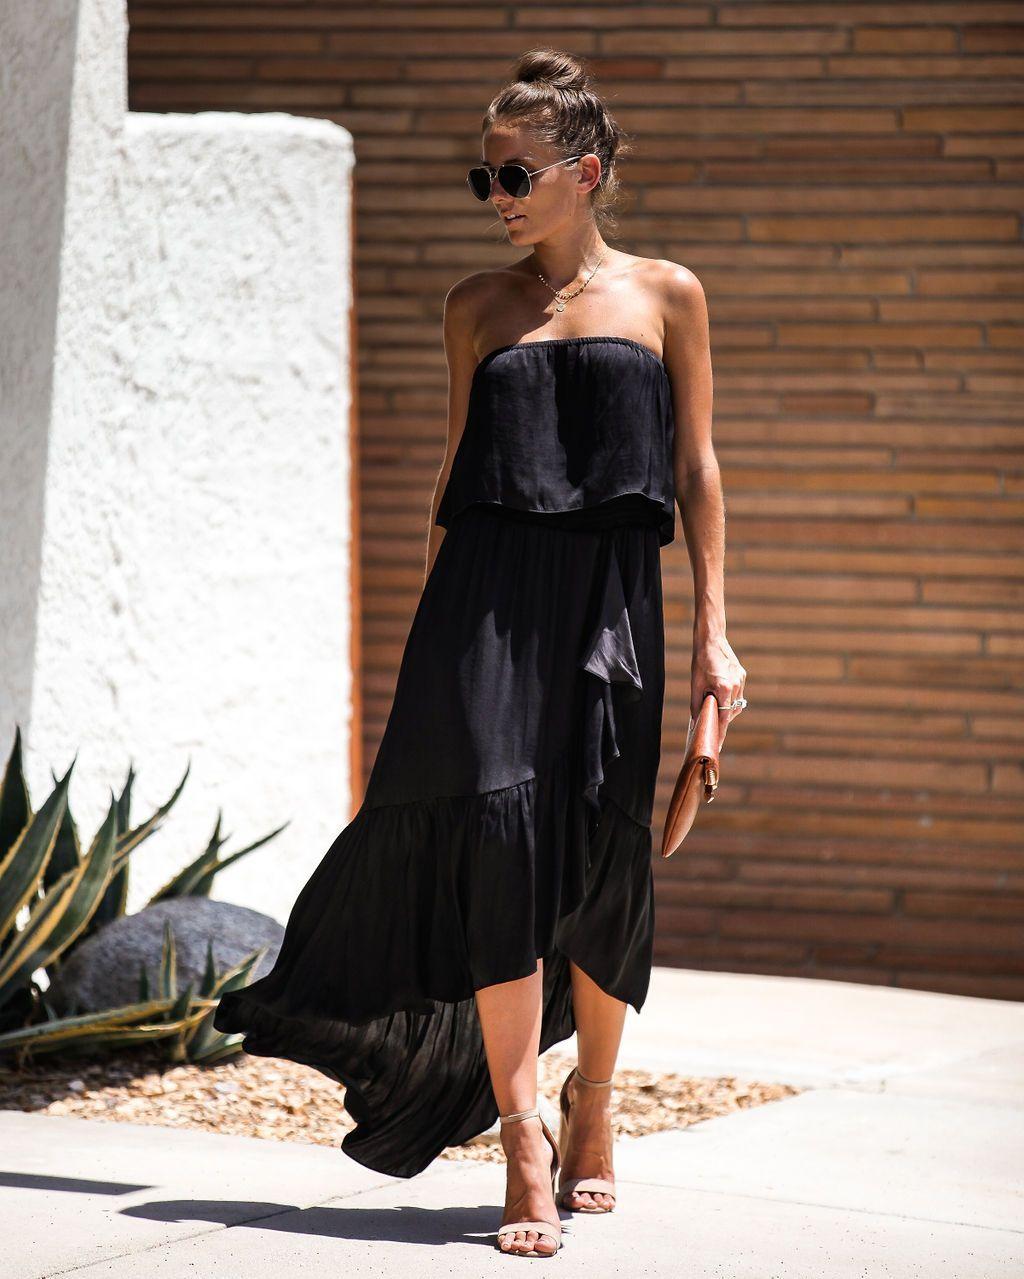 Have A Ball Strapless Ruffle Maxi Dress Black Black Maxi Dress Printed Wrap Dresses Maxi Dress [ 1279 x 1024 Pixel ]